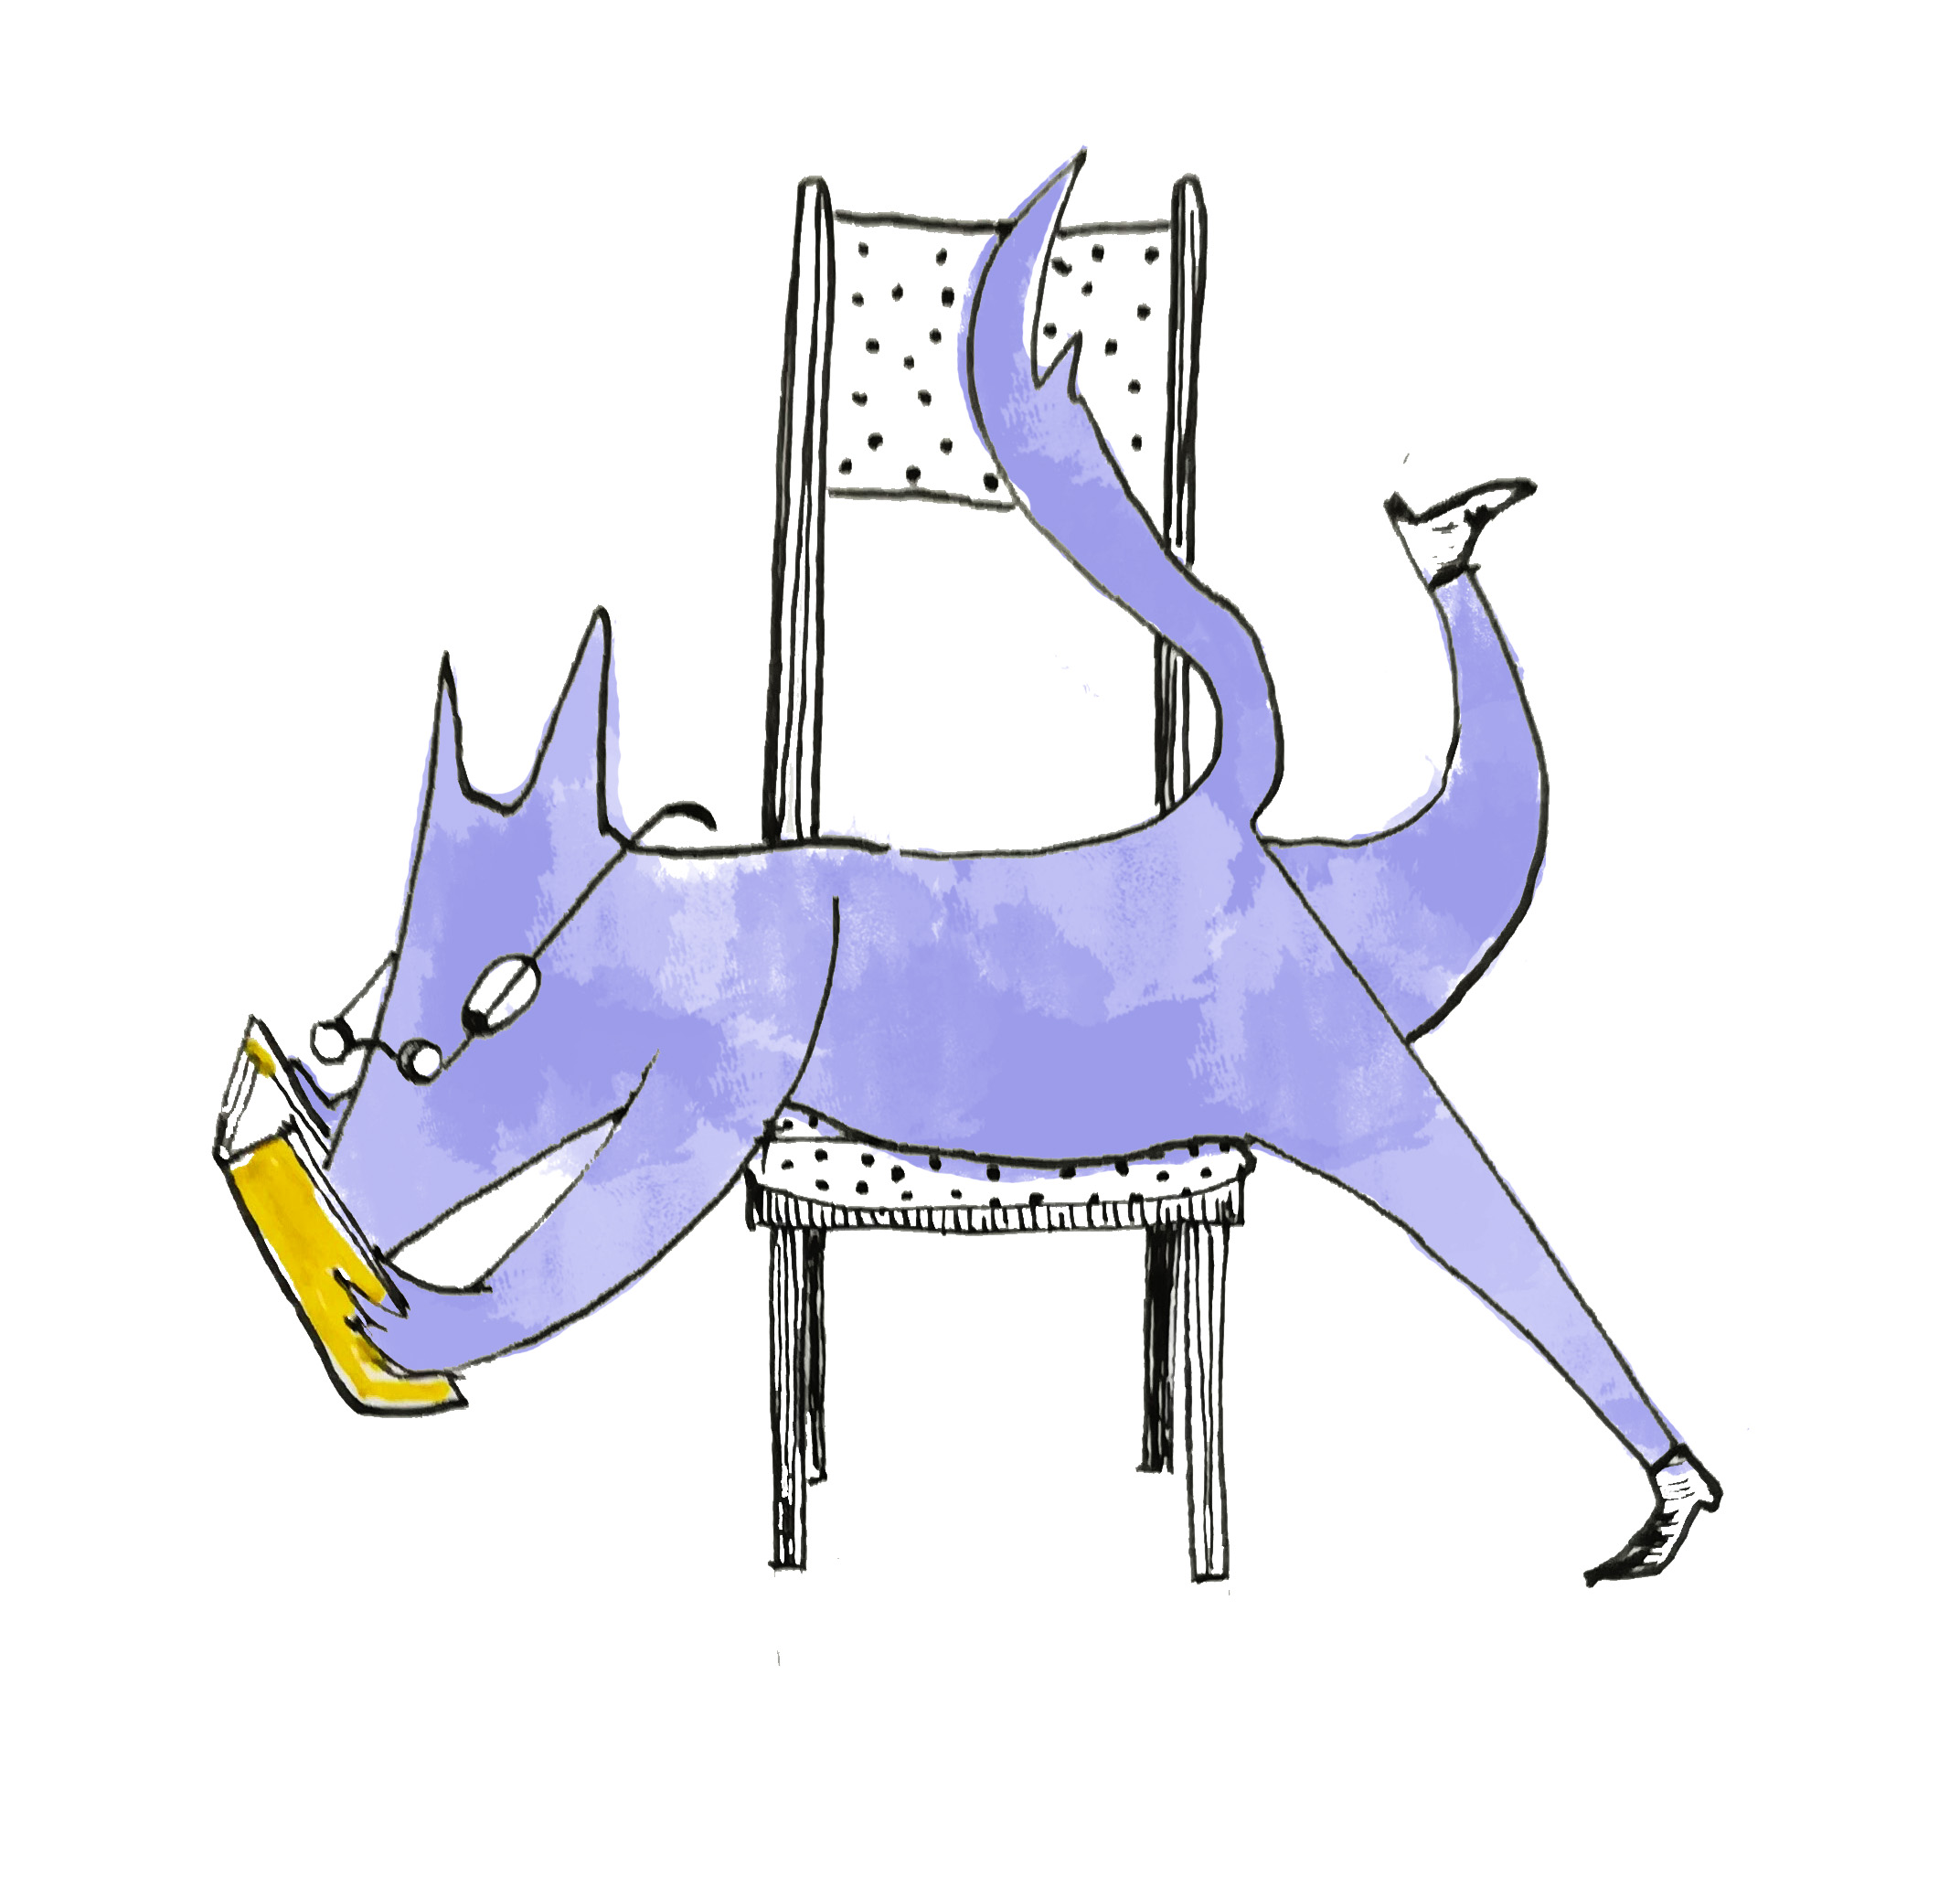 ninalaluna-how-to-become-a-book-taster